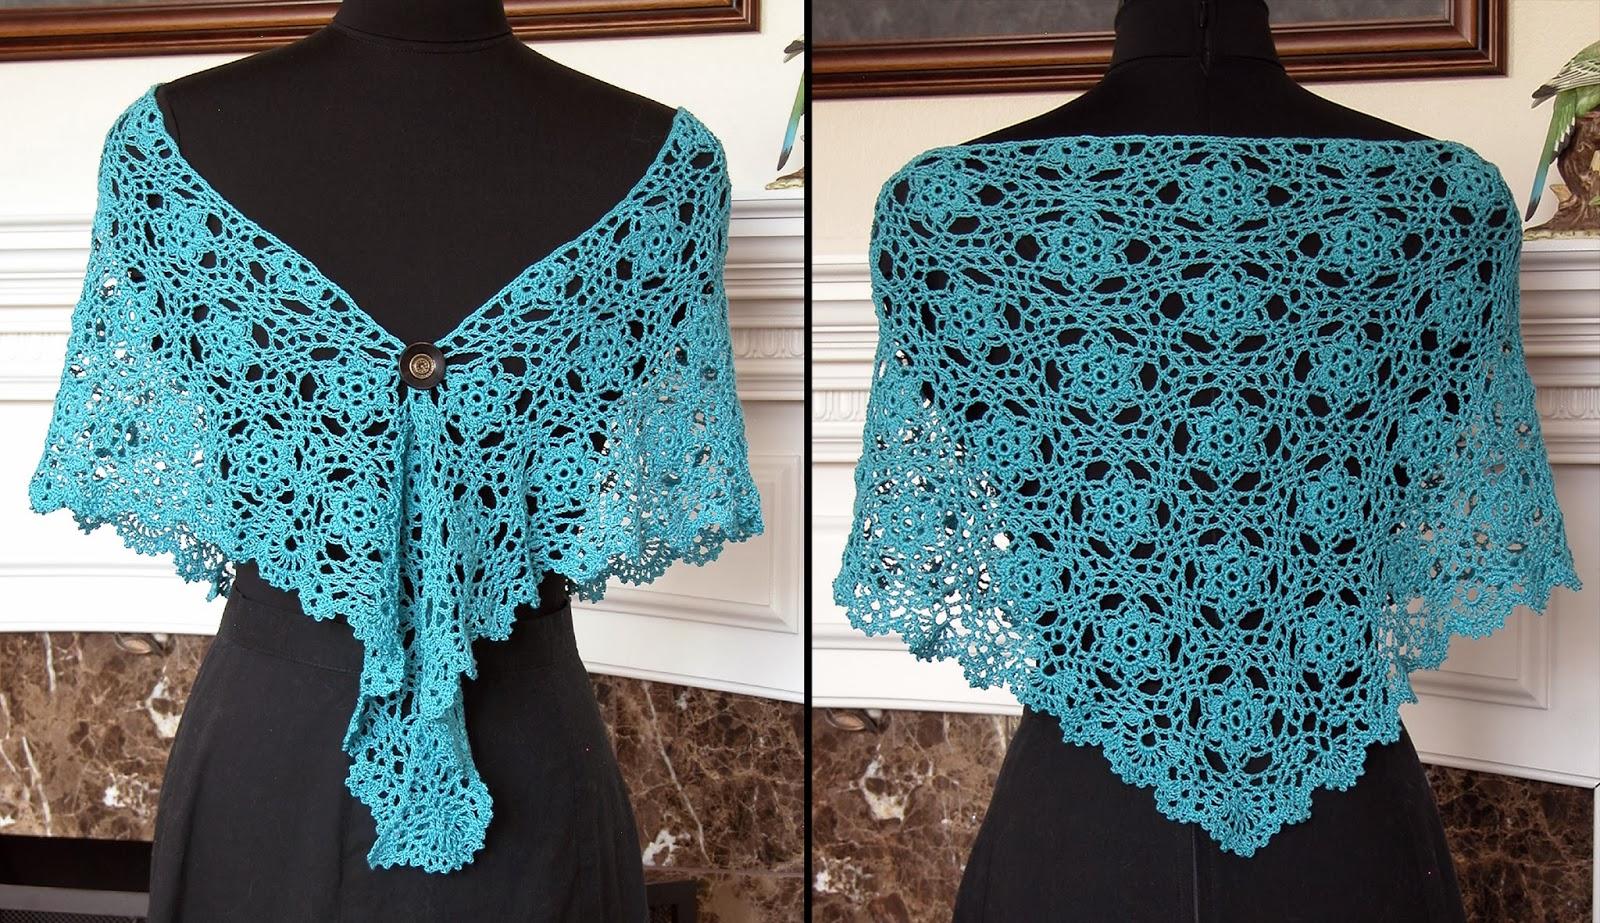 Old Fashioned Evening Shawl Crochet Pattern Photo - Sewing Pattern ...